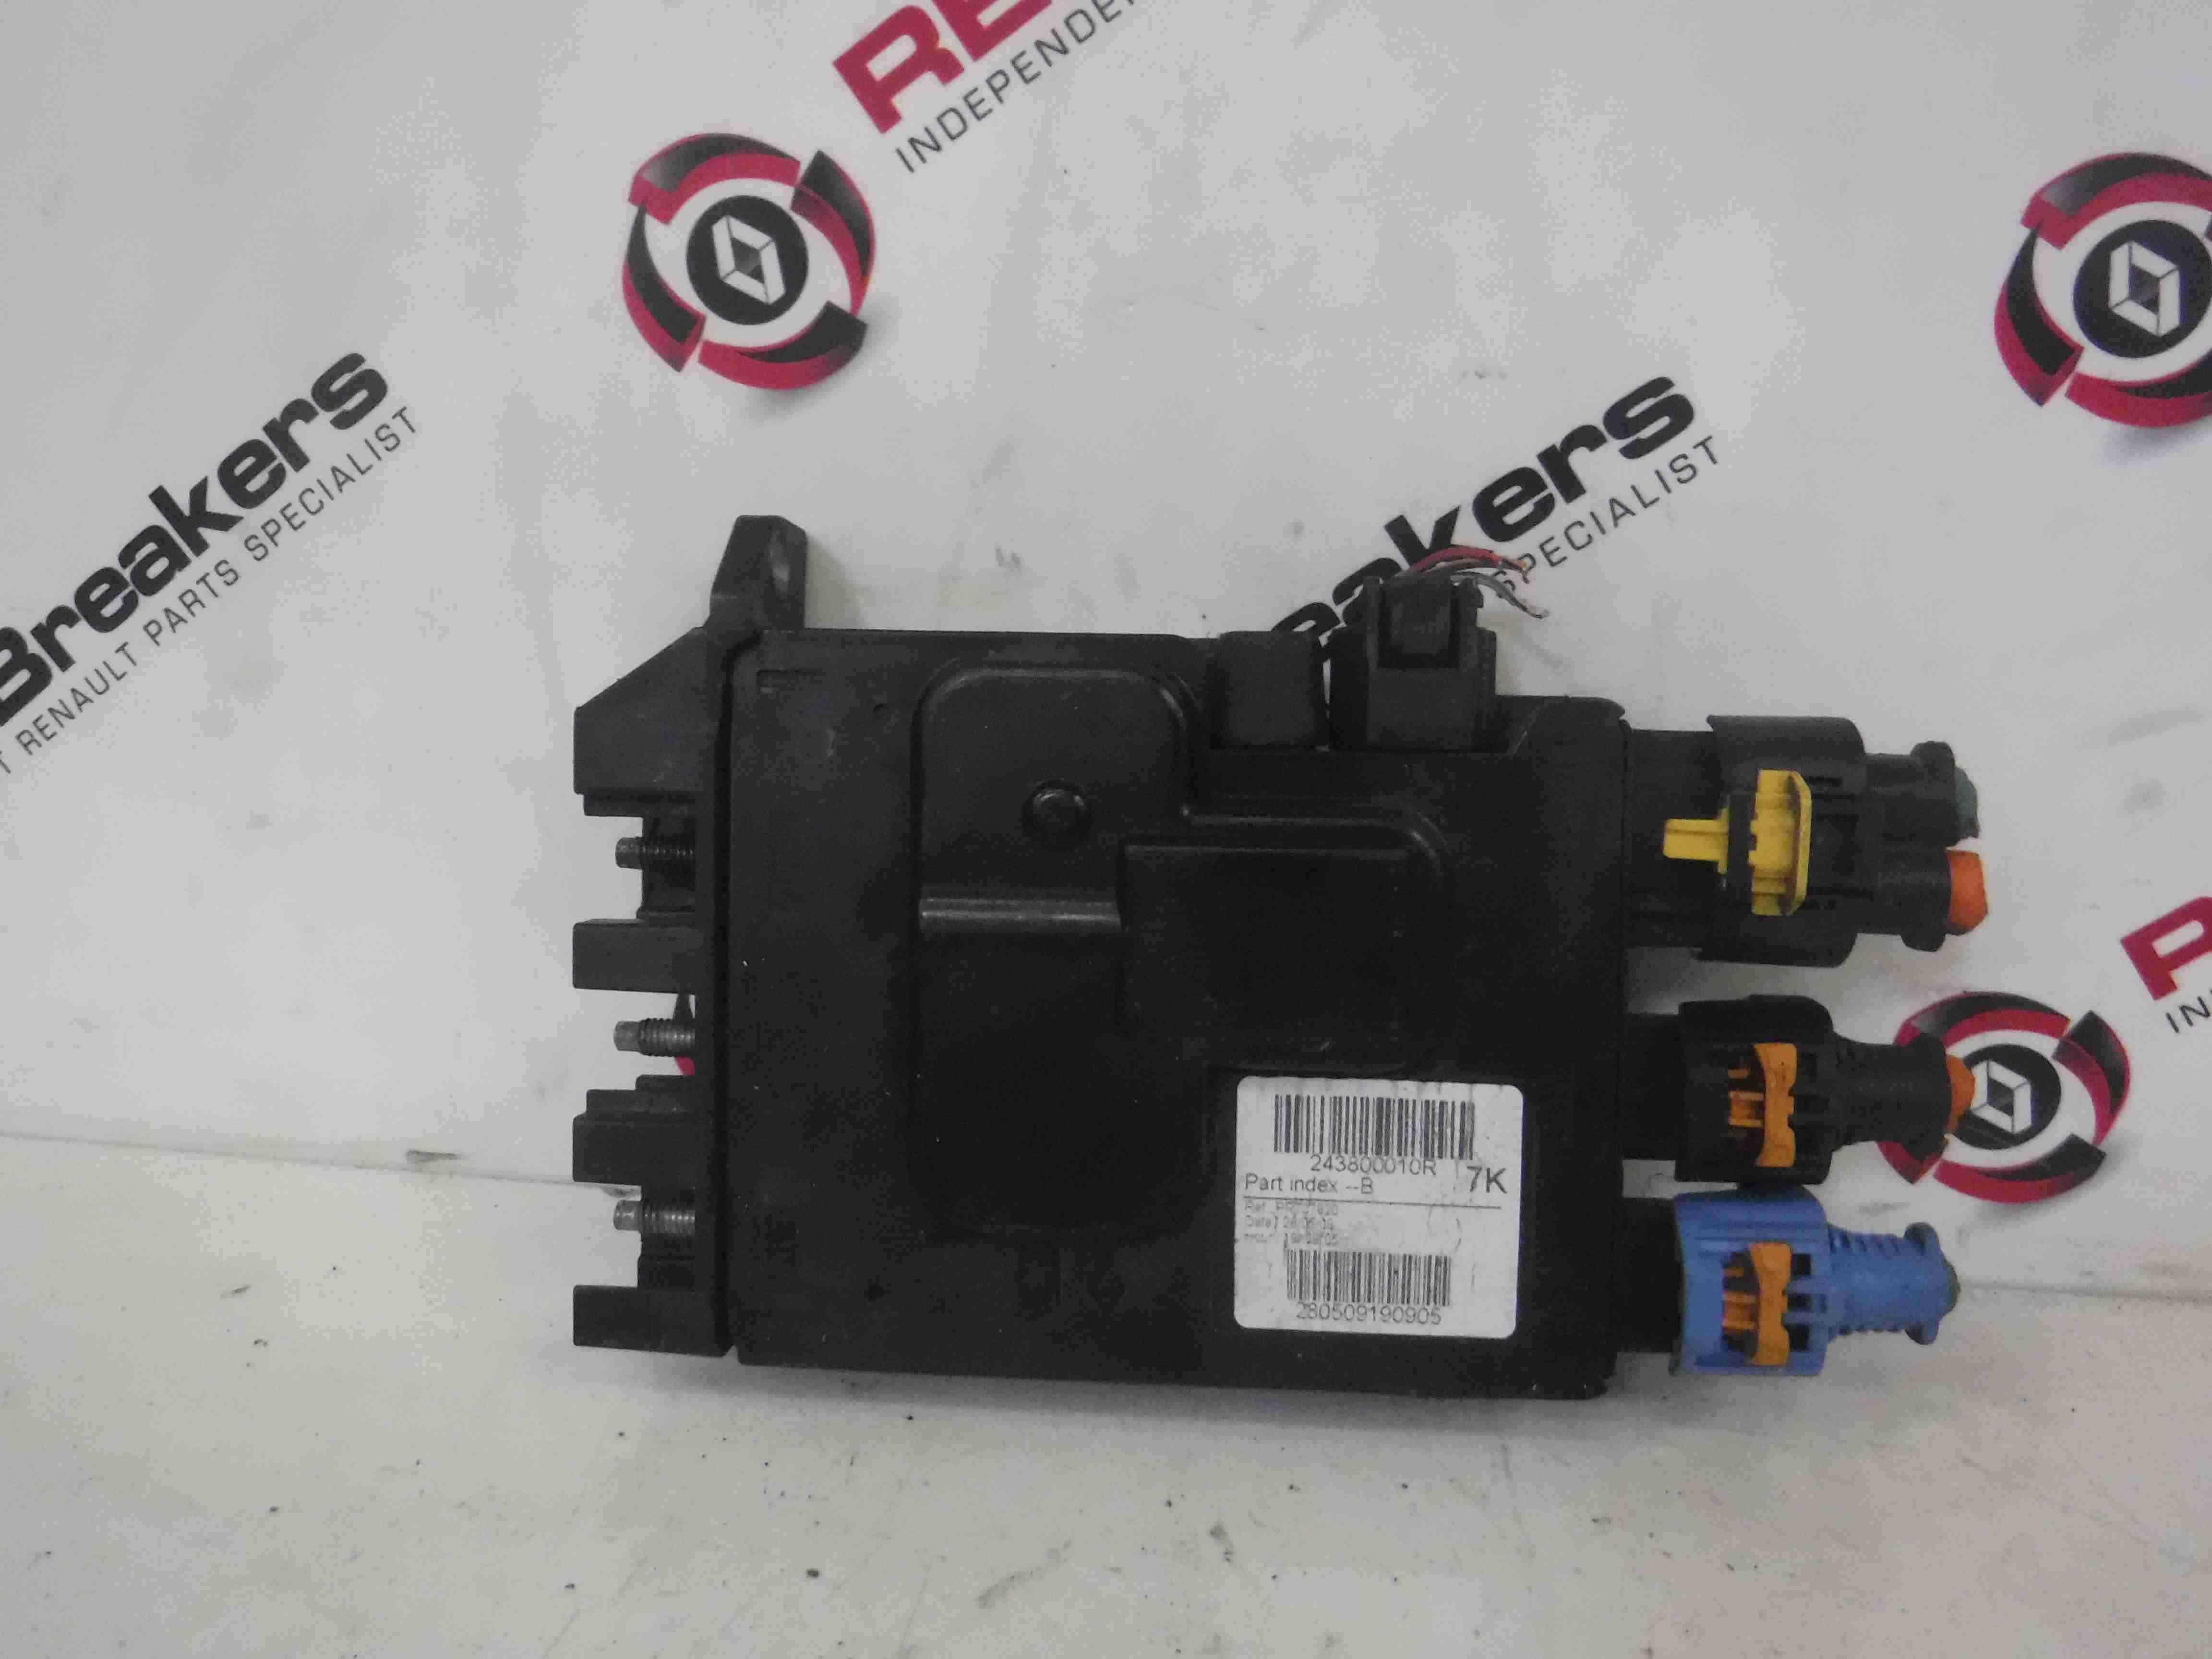 Renault Megane MK3 2008-2014 1.6 Battery Fuse Box 243800010R